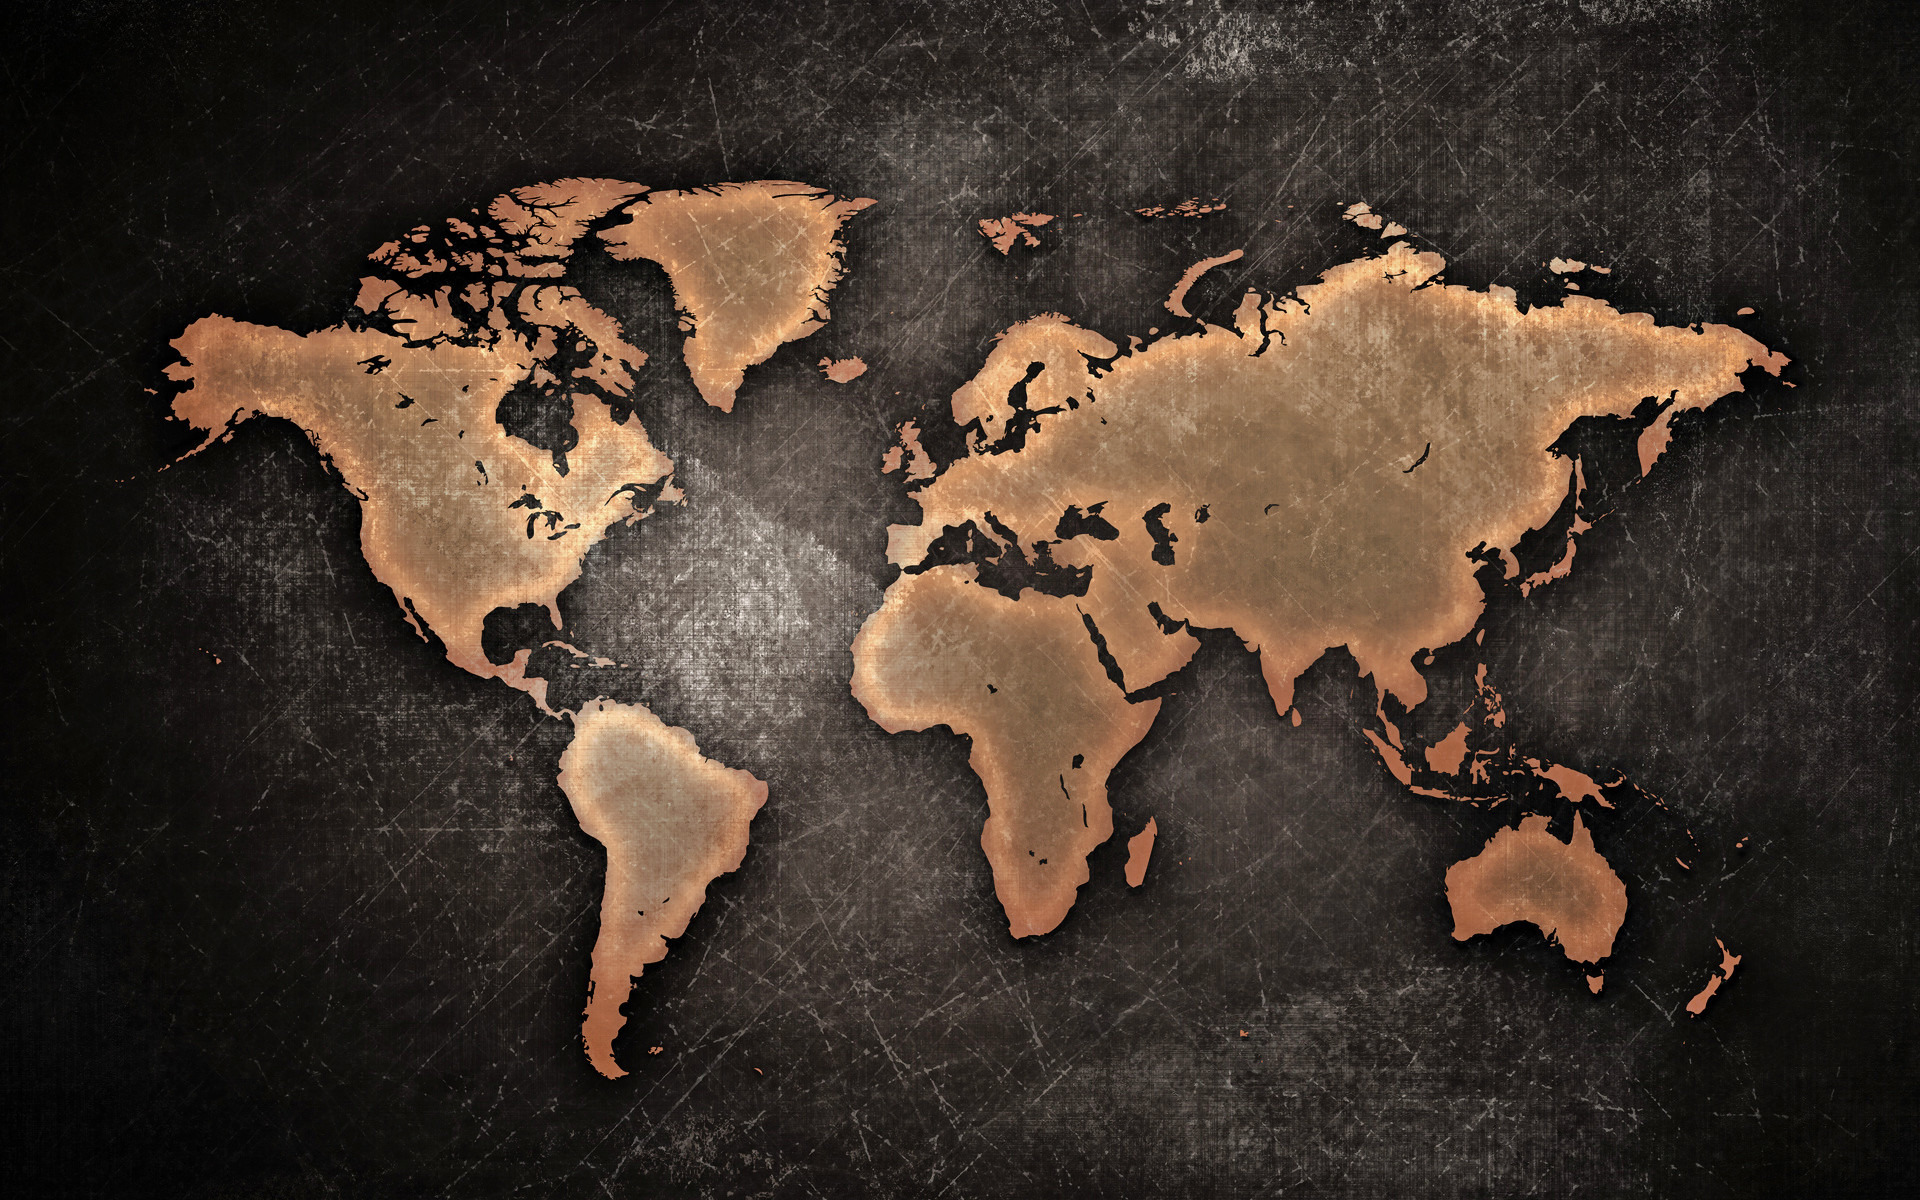 World map desktop background 1920x1200 grunge world map hd desktop wallpaper download country gumiabroncs Image collections